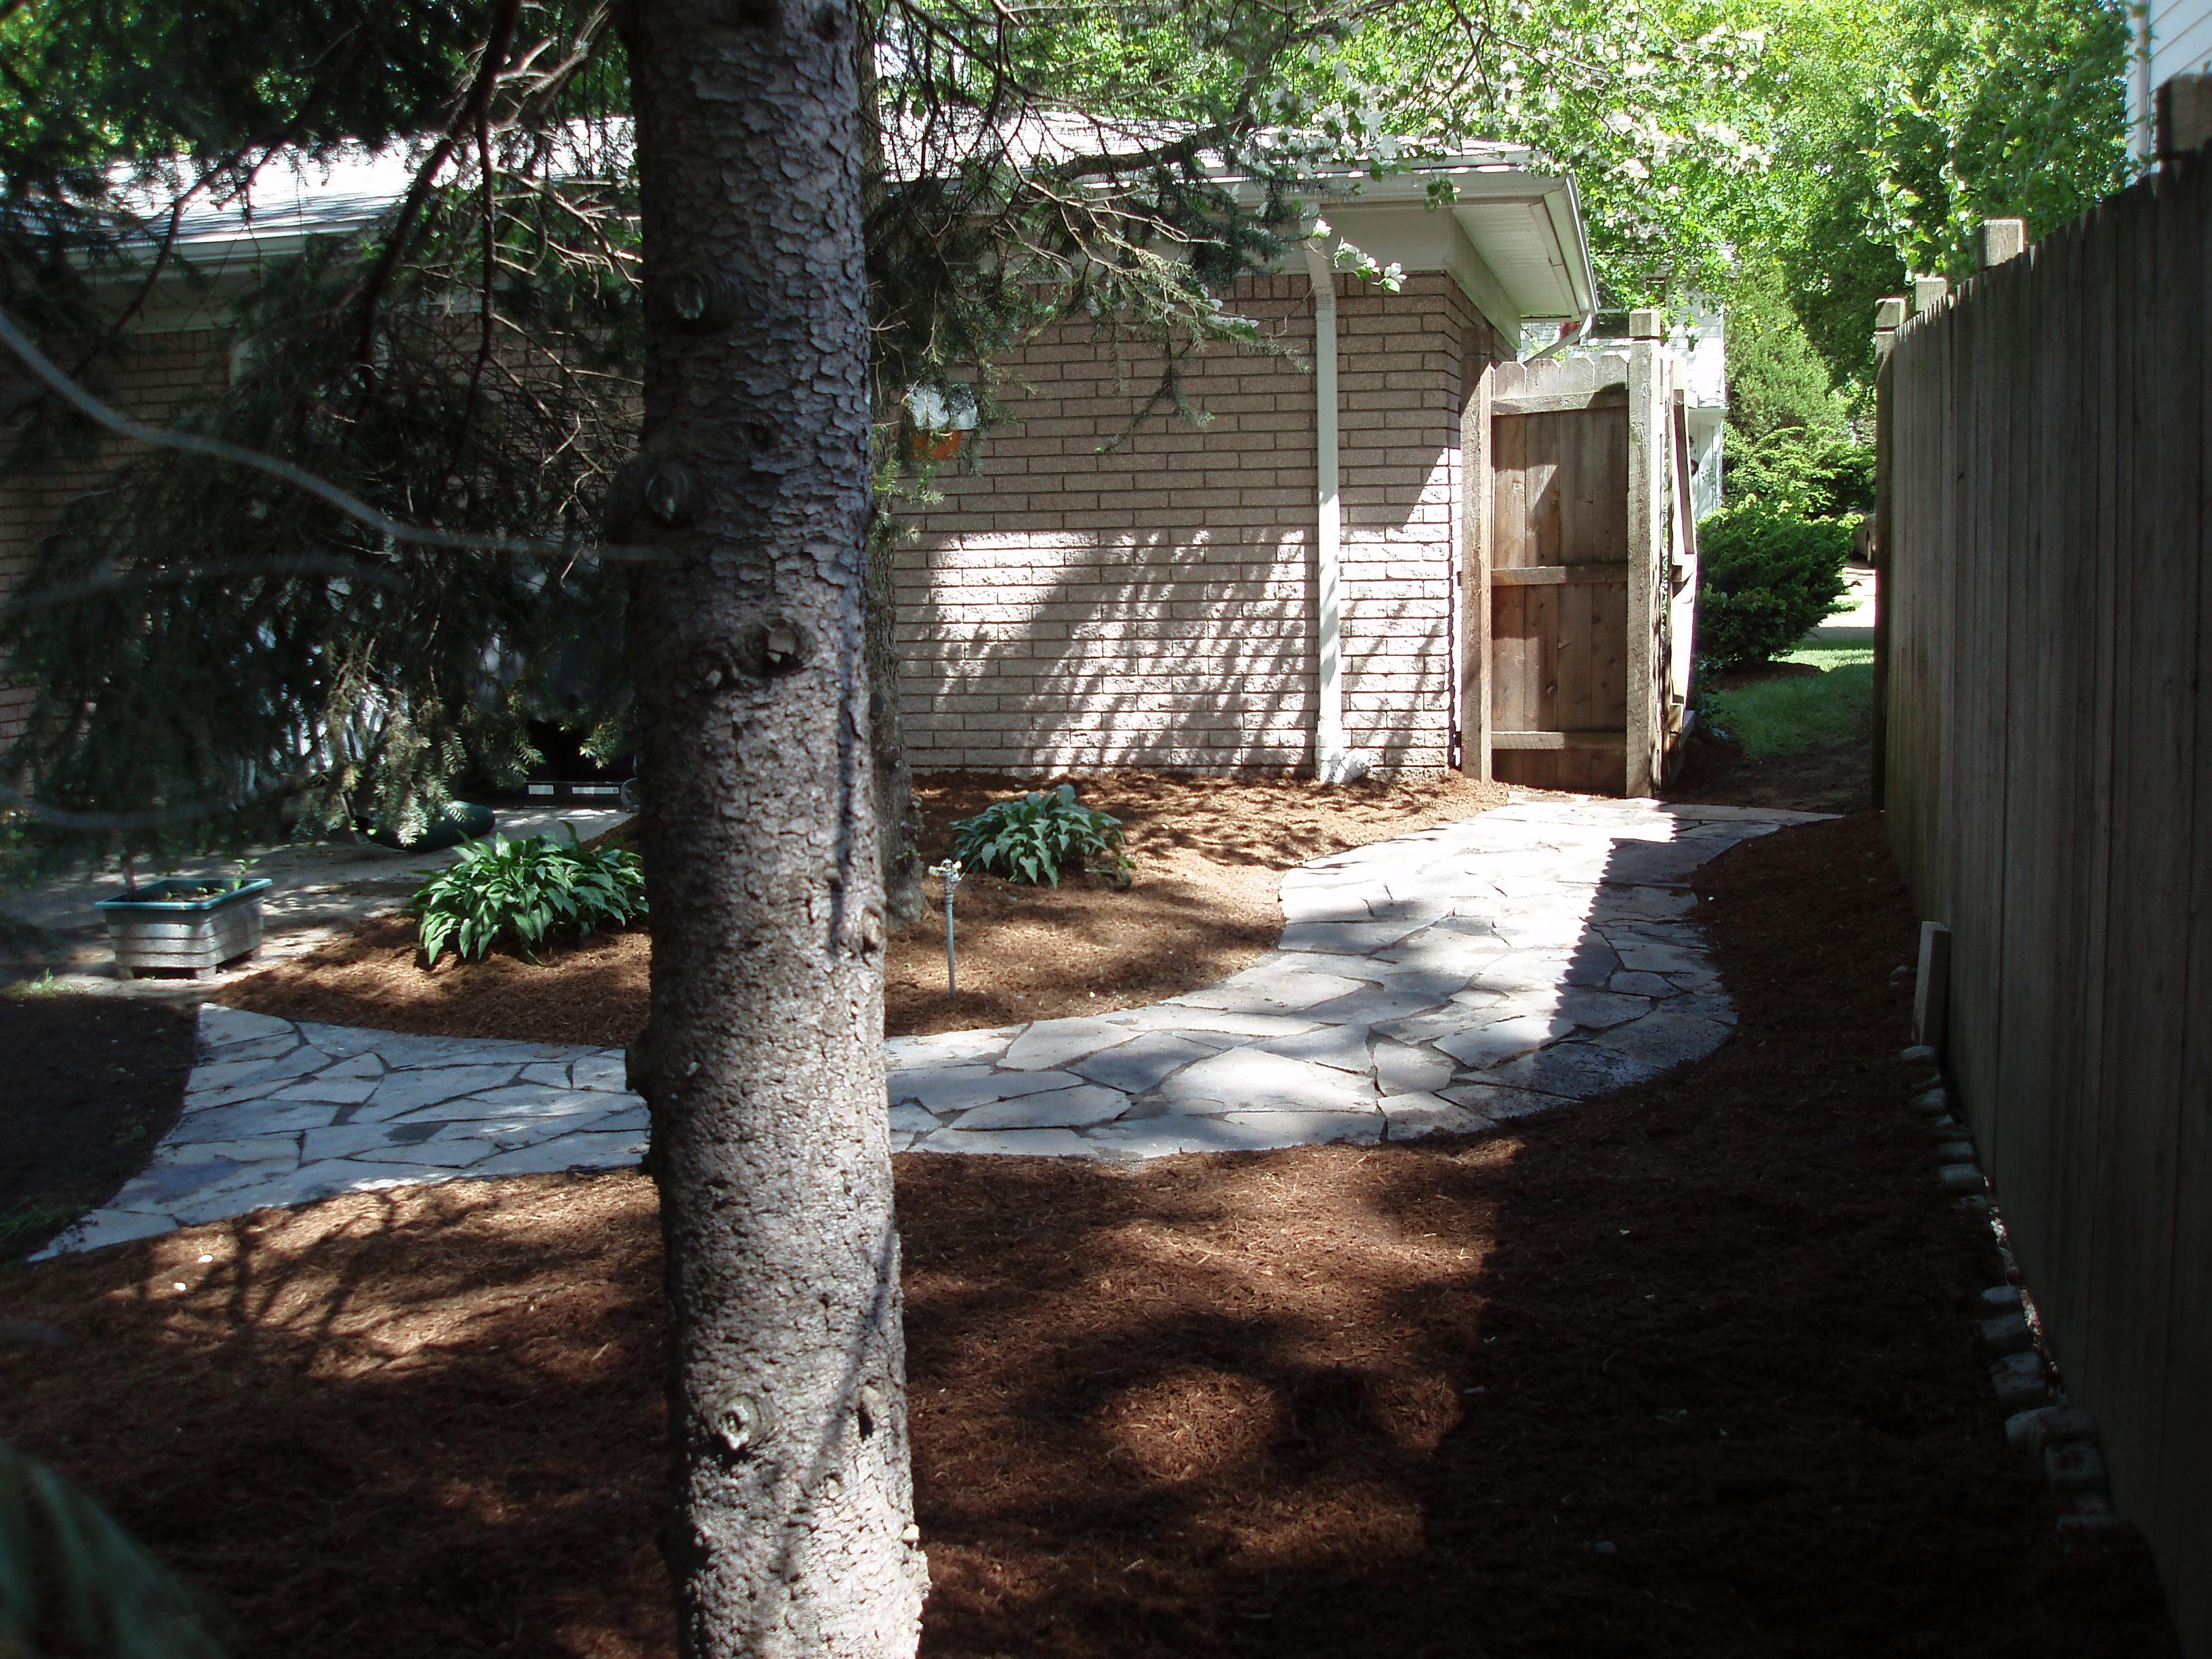 mulch total lawn care inc full lawn maintenance lawn